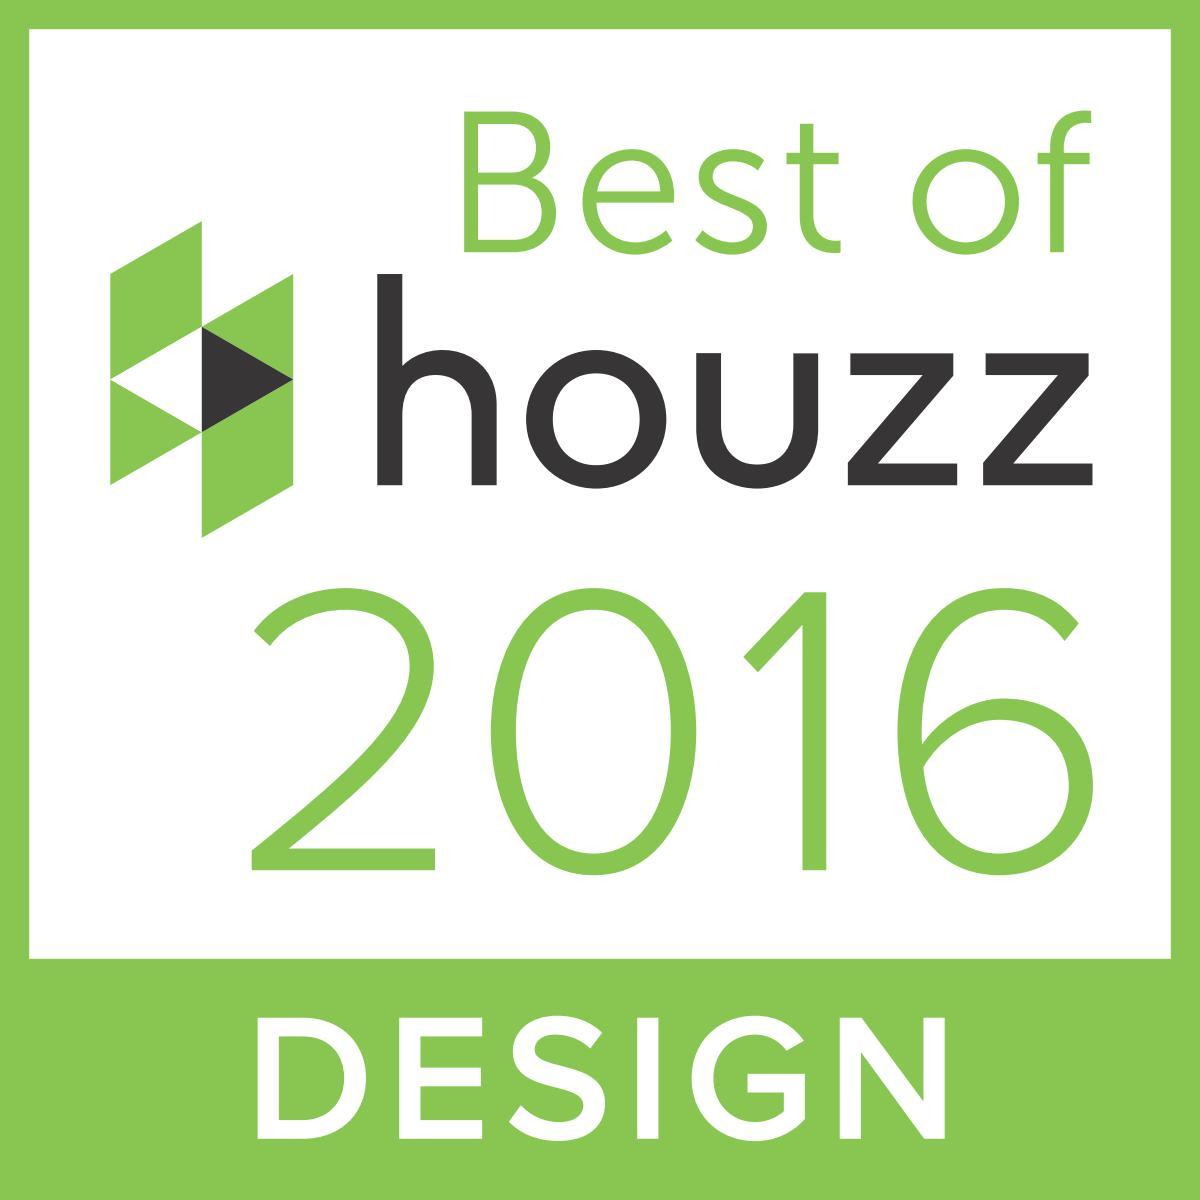 Houzz 2016 Design Award